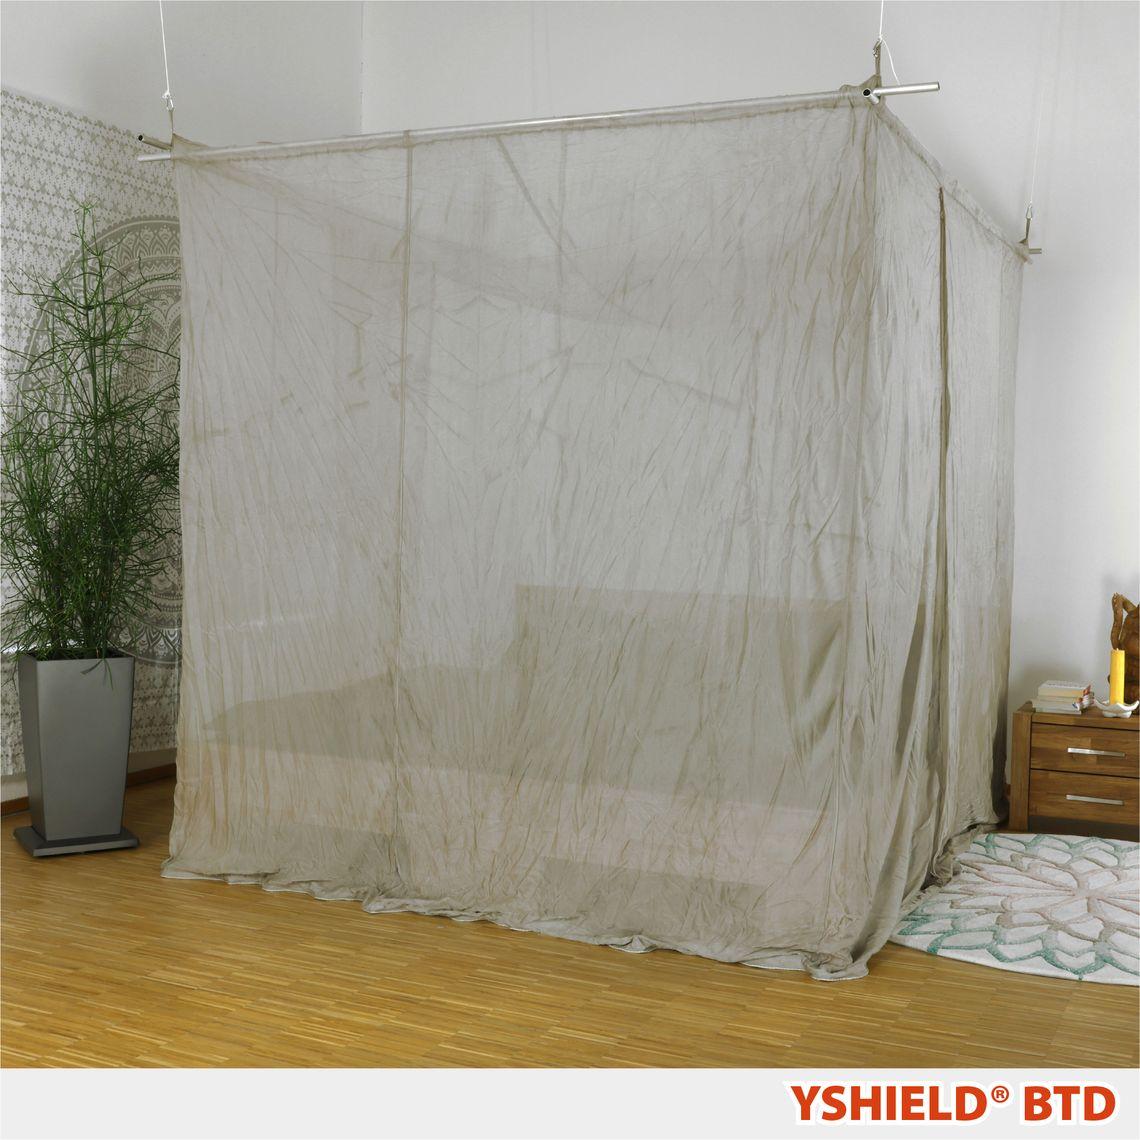 YSHIELD® BTD-M   Abschirmbaldachin   Doppelbett   SILVER-TULLE   Miete 14 Tage